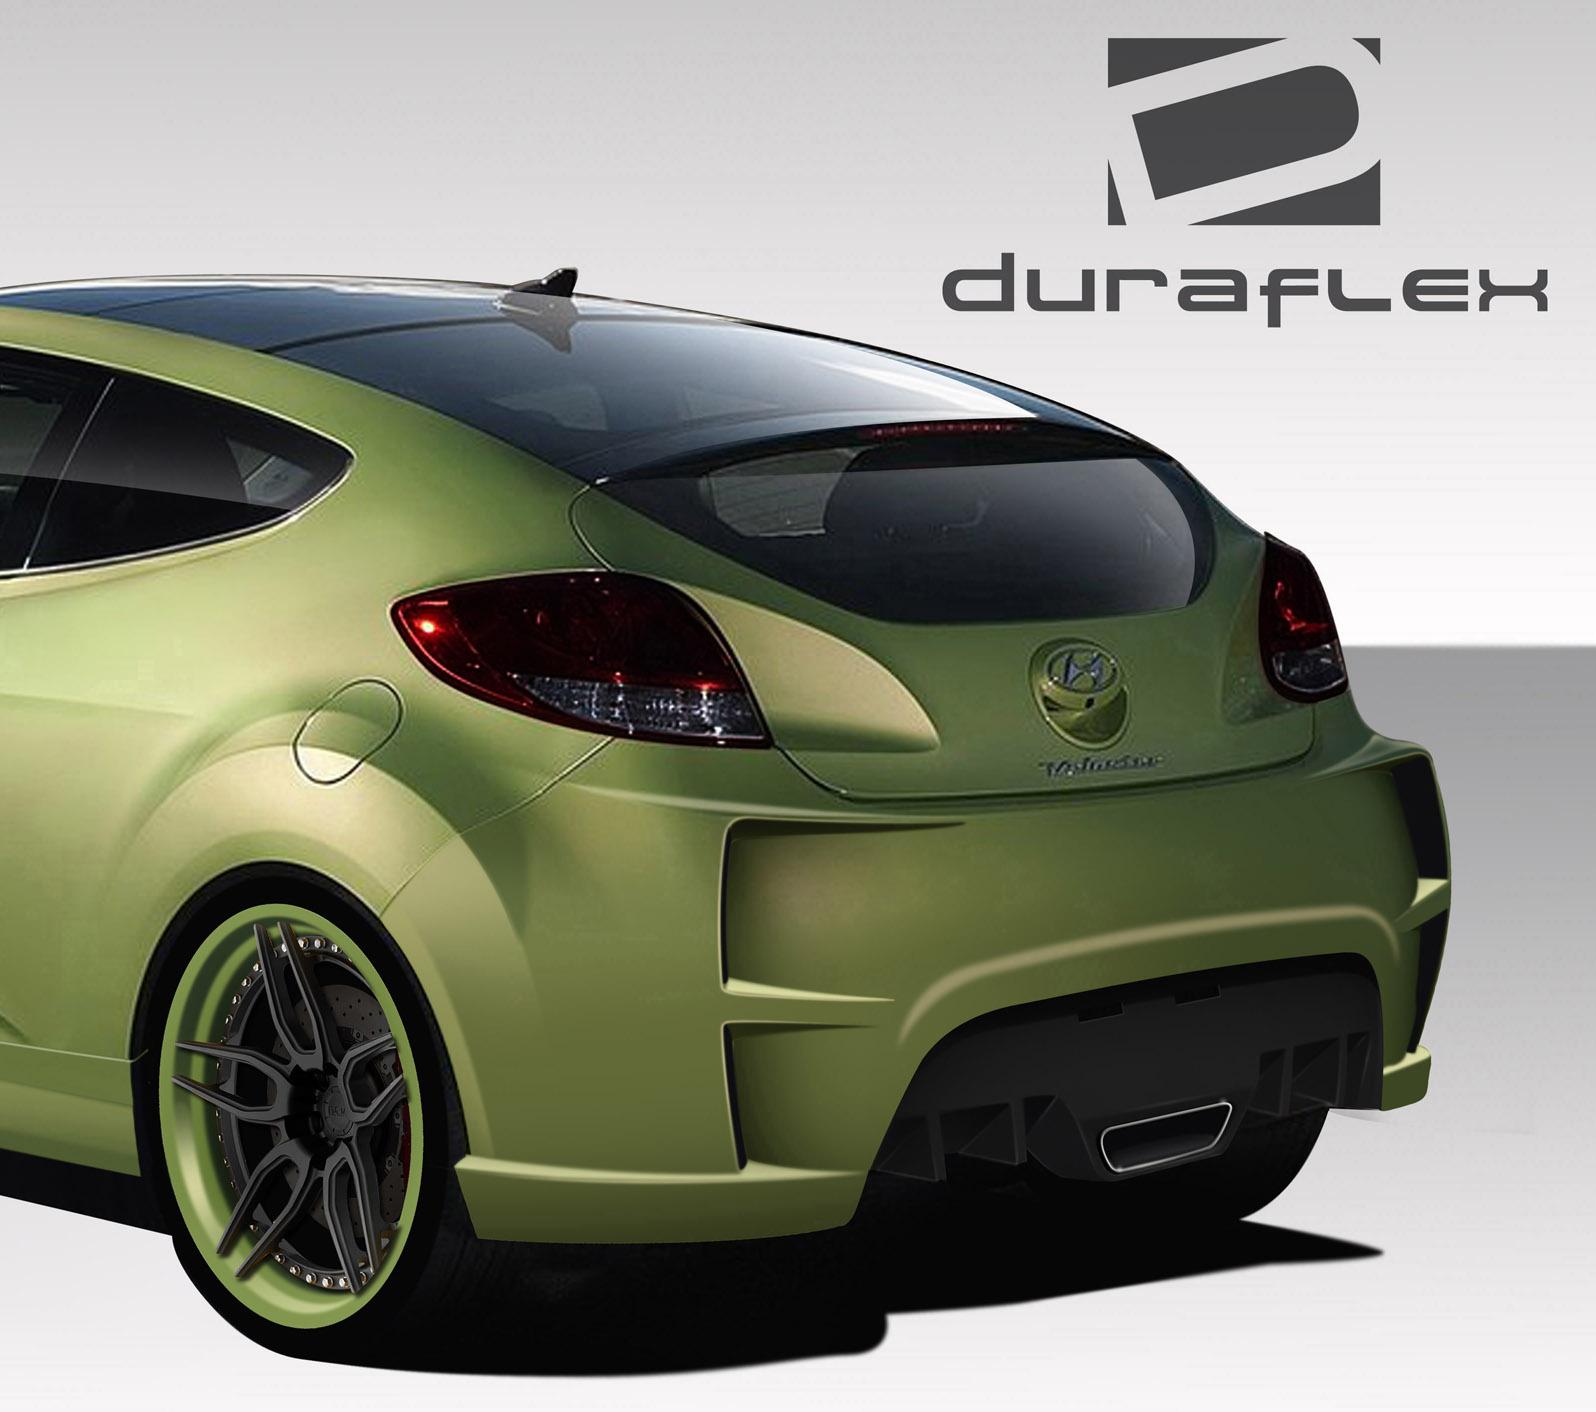 2012-2016 Hyundai Veloster Duraflex VG-R Rear Bumper Cover - 1 Piece